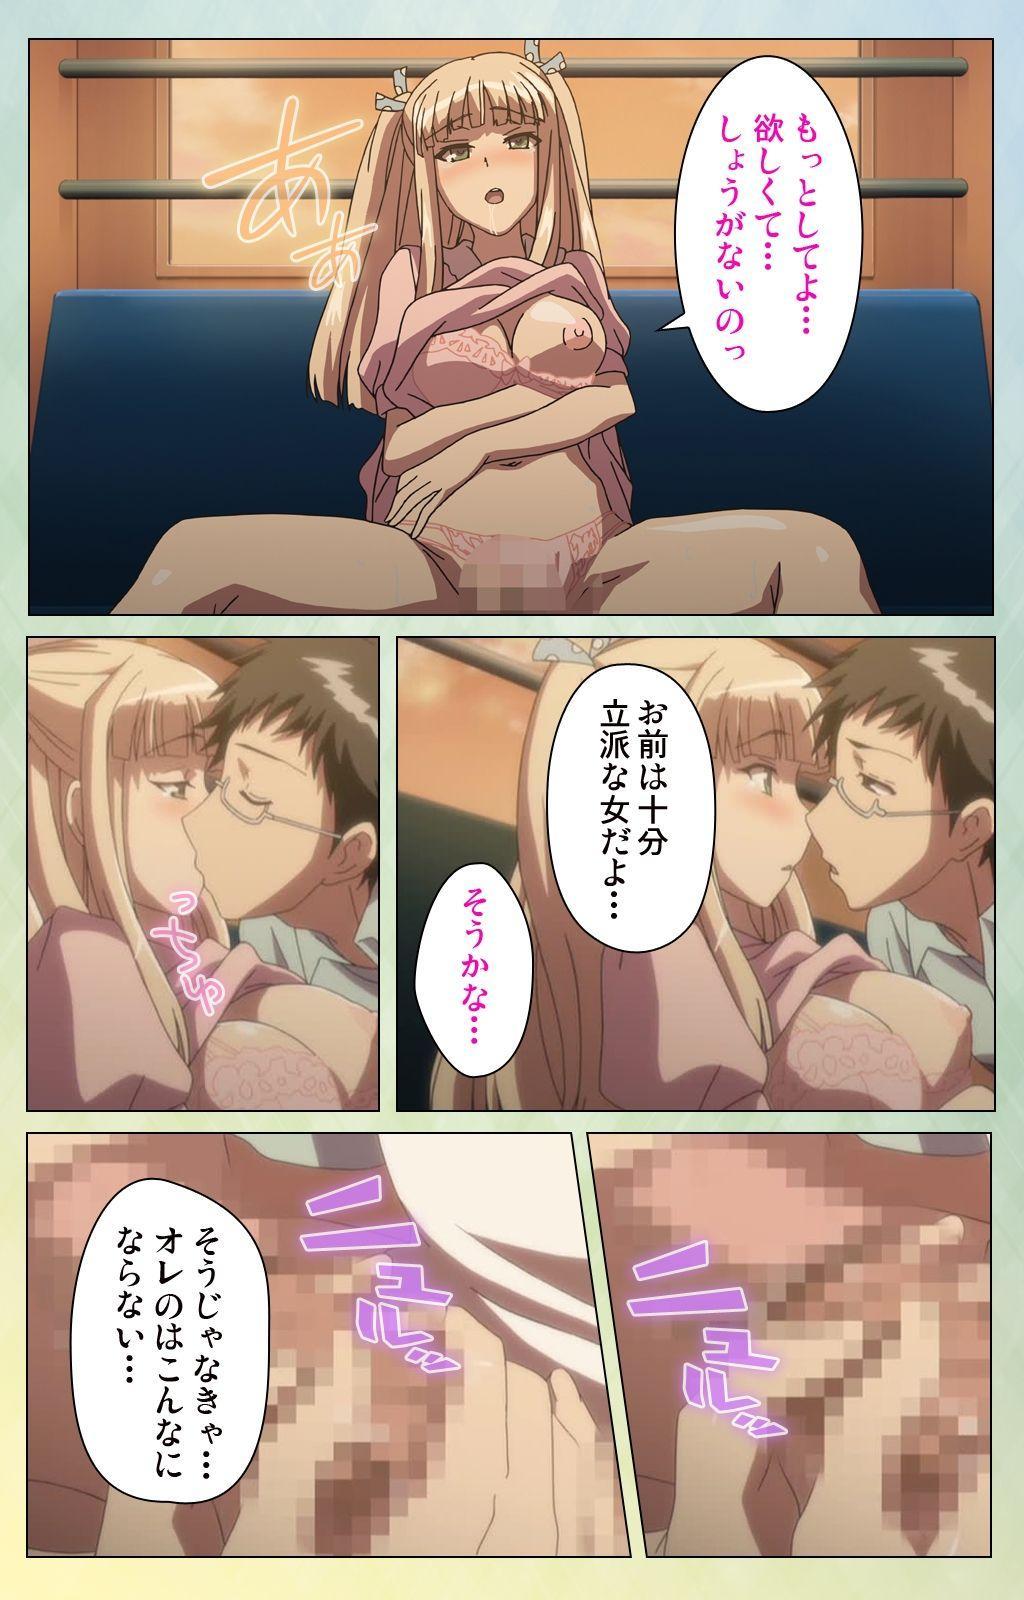 Furueru Kuchibiru fuzzy lips1 Complete Ban 66